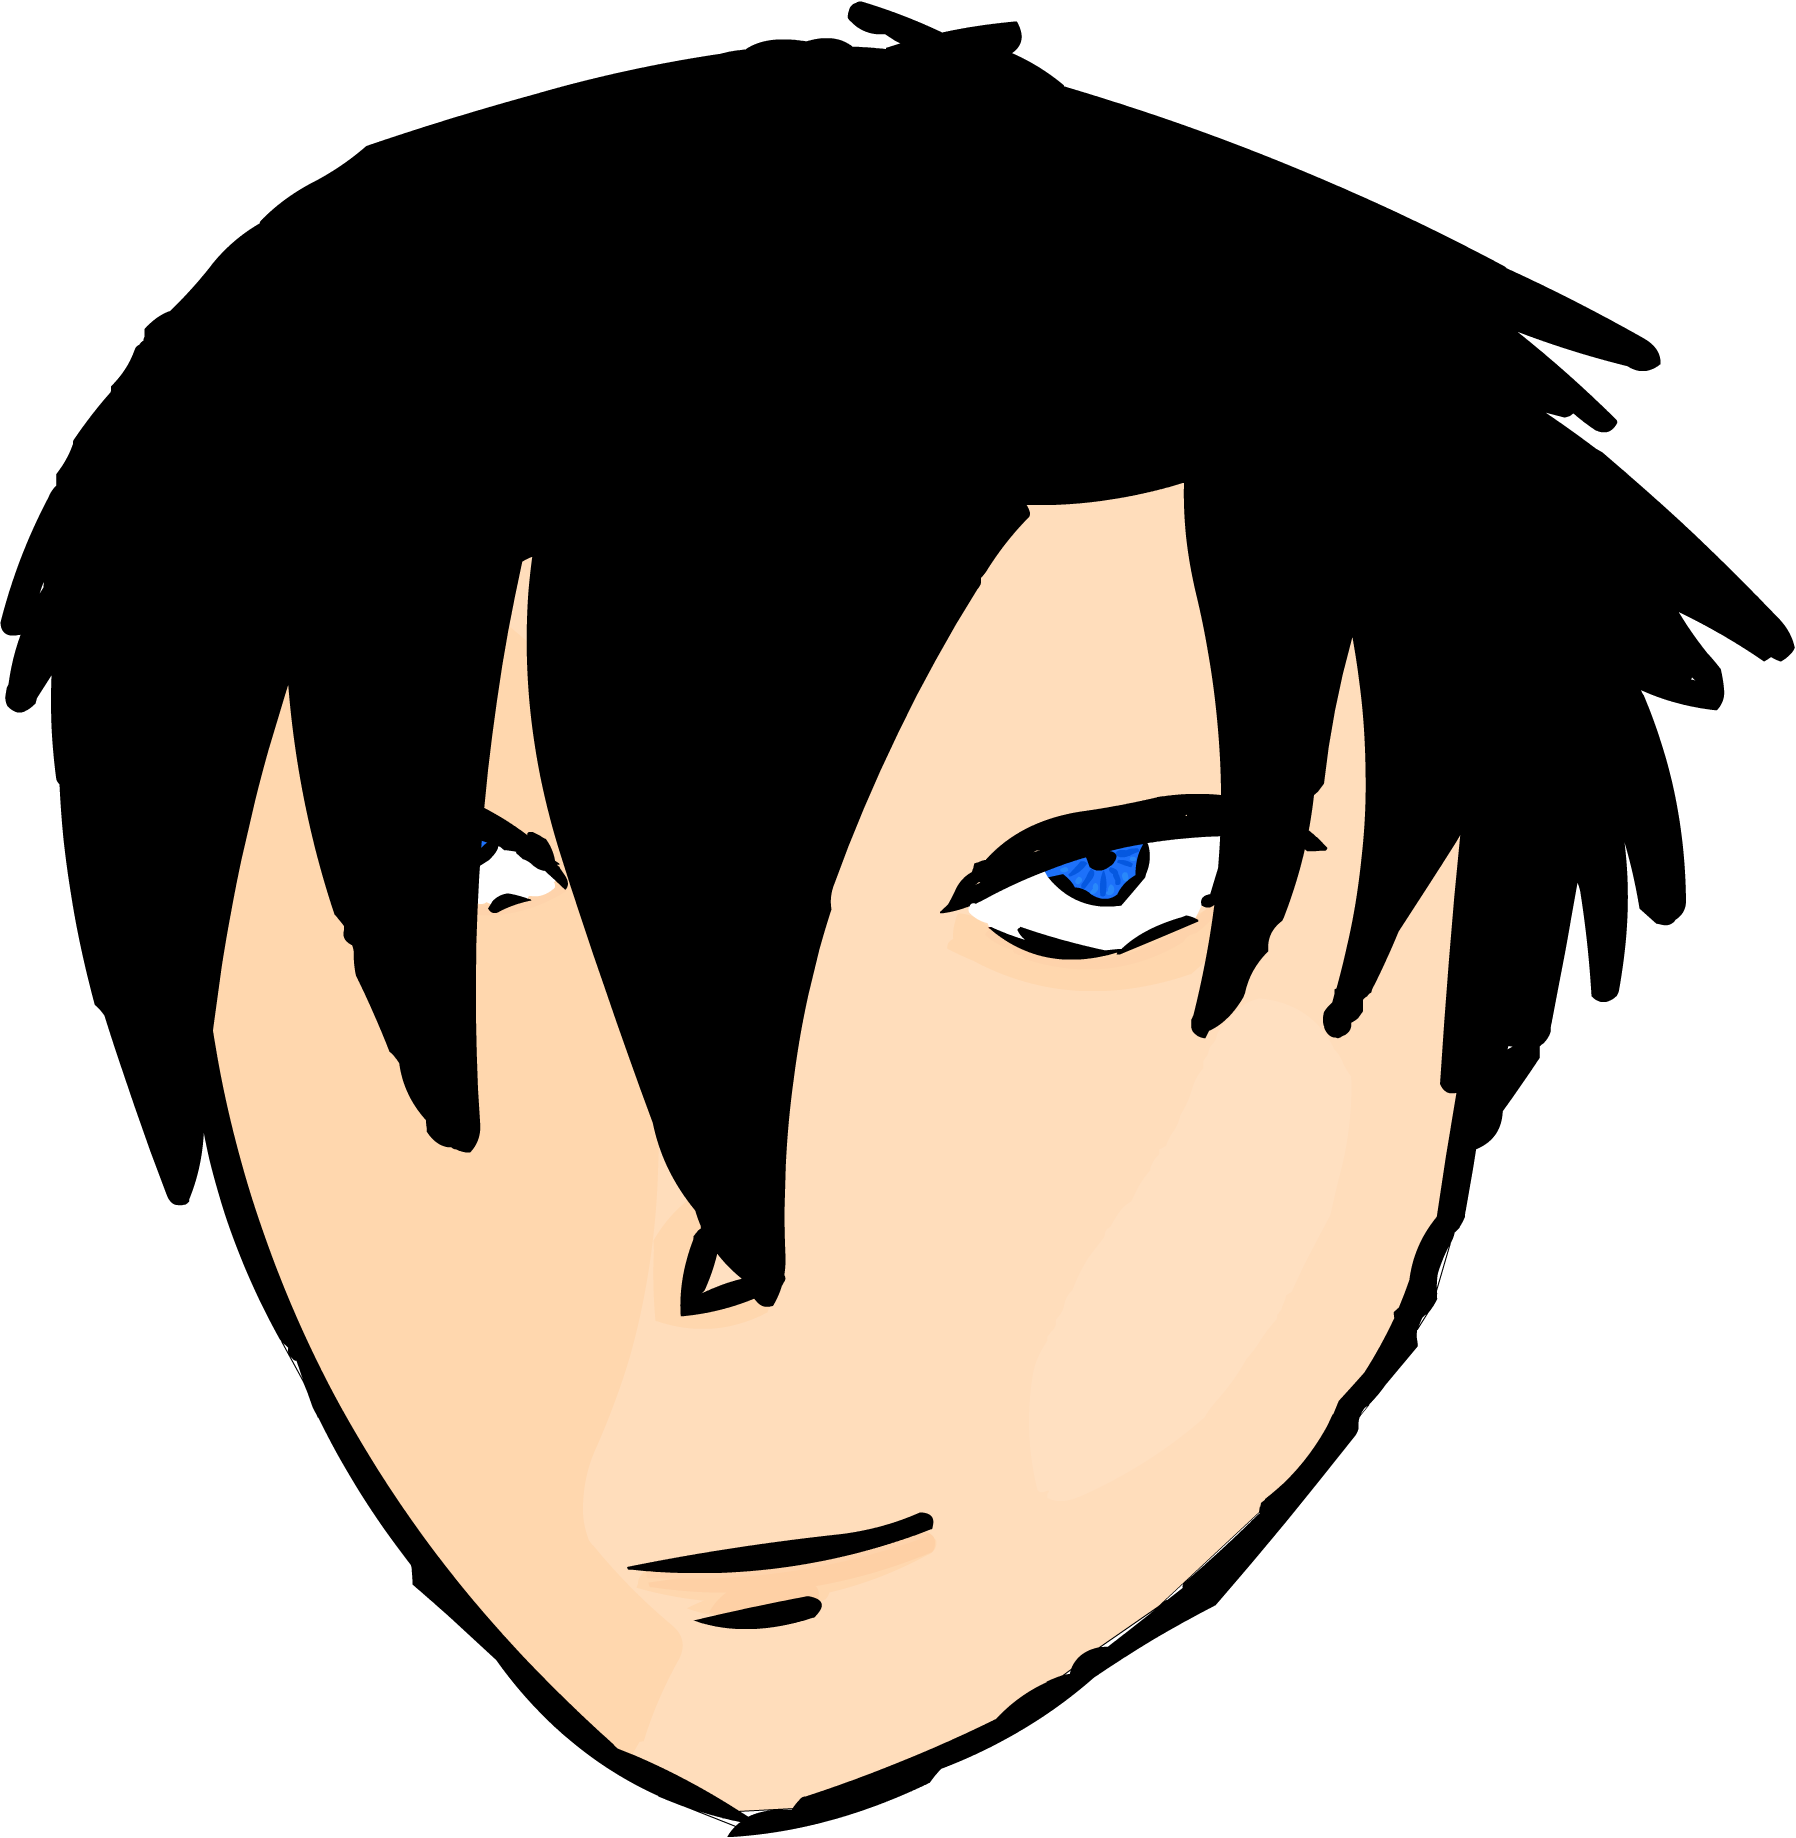 Random angry guy ^^